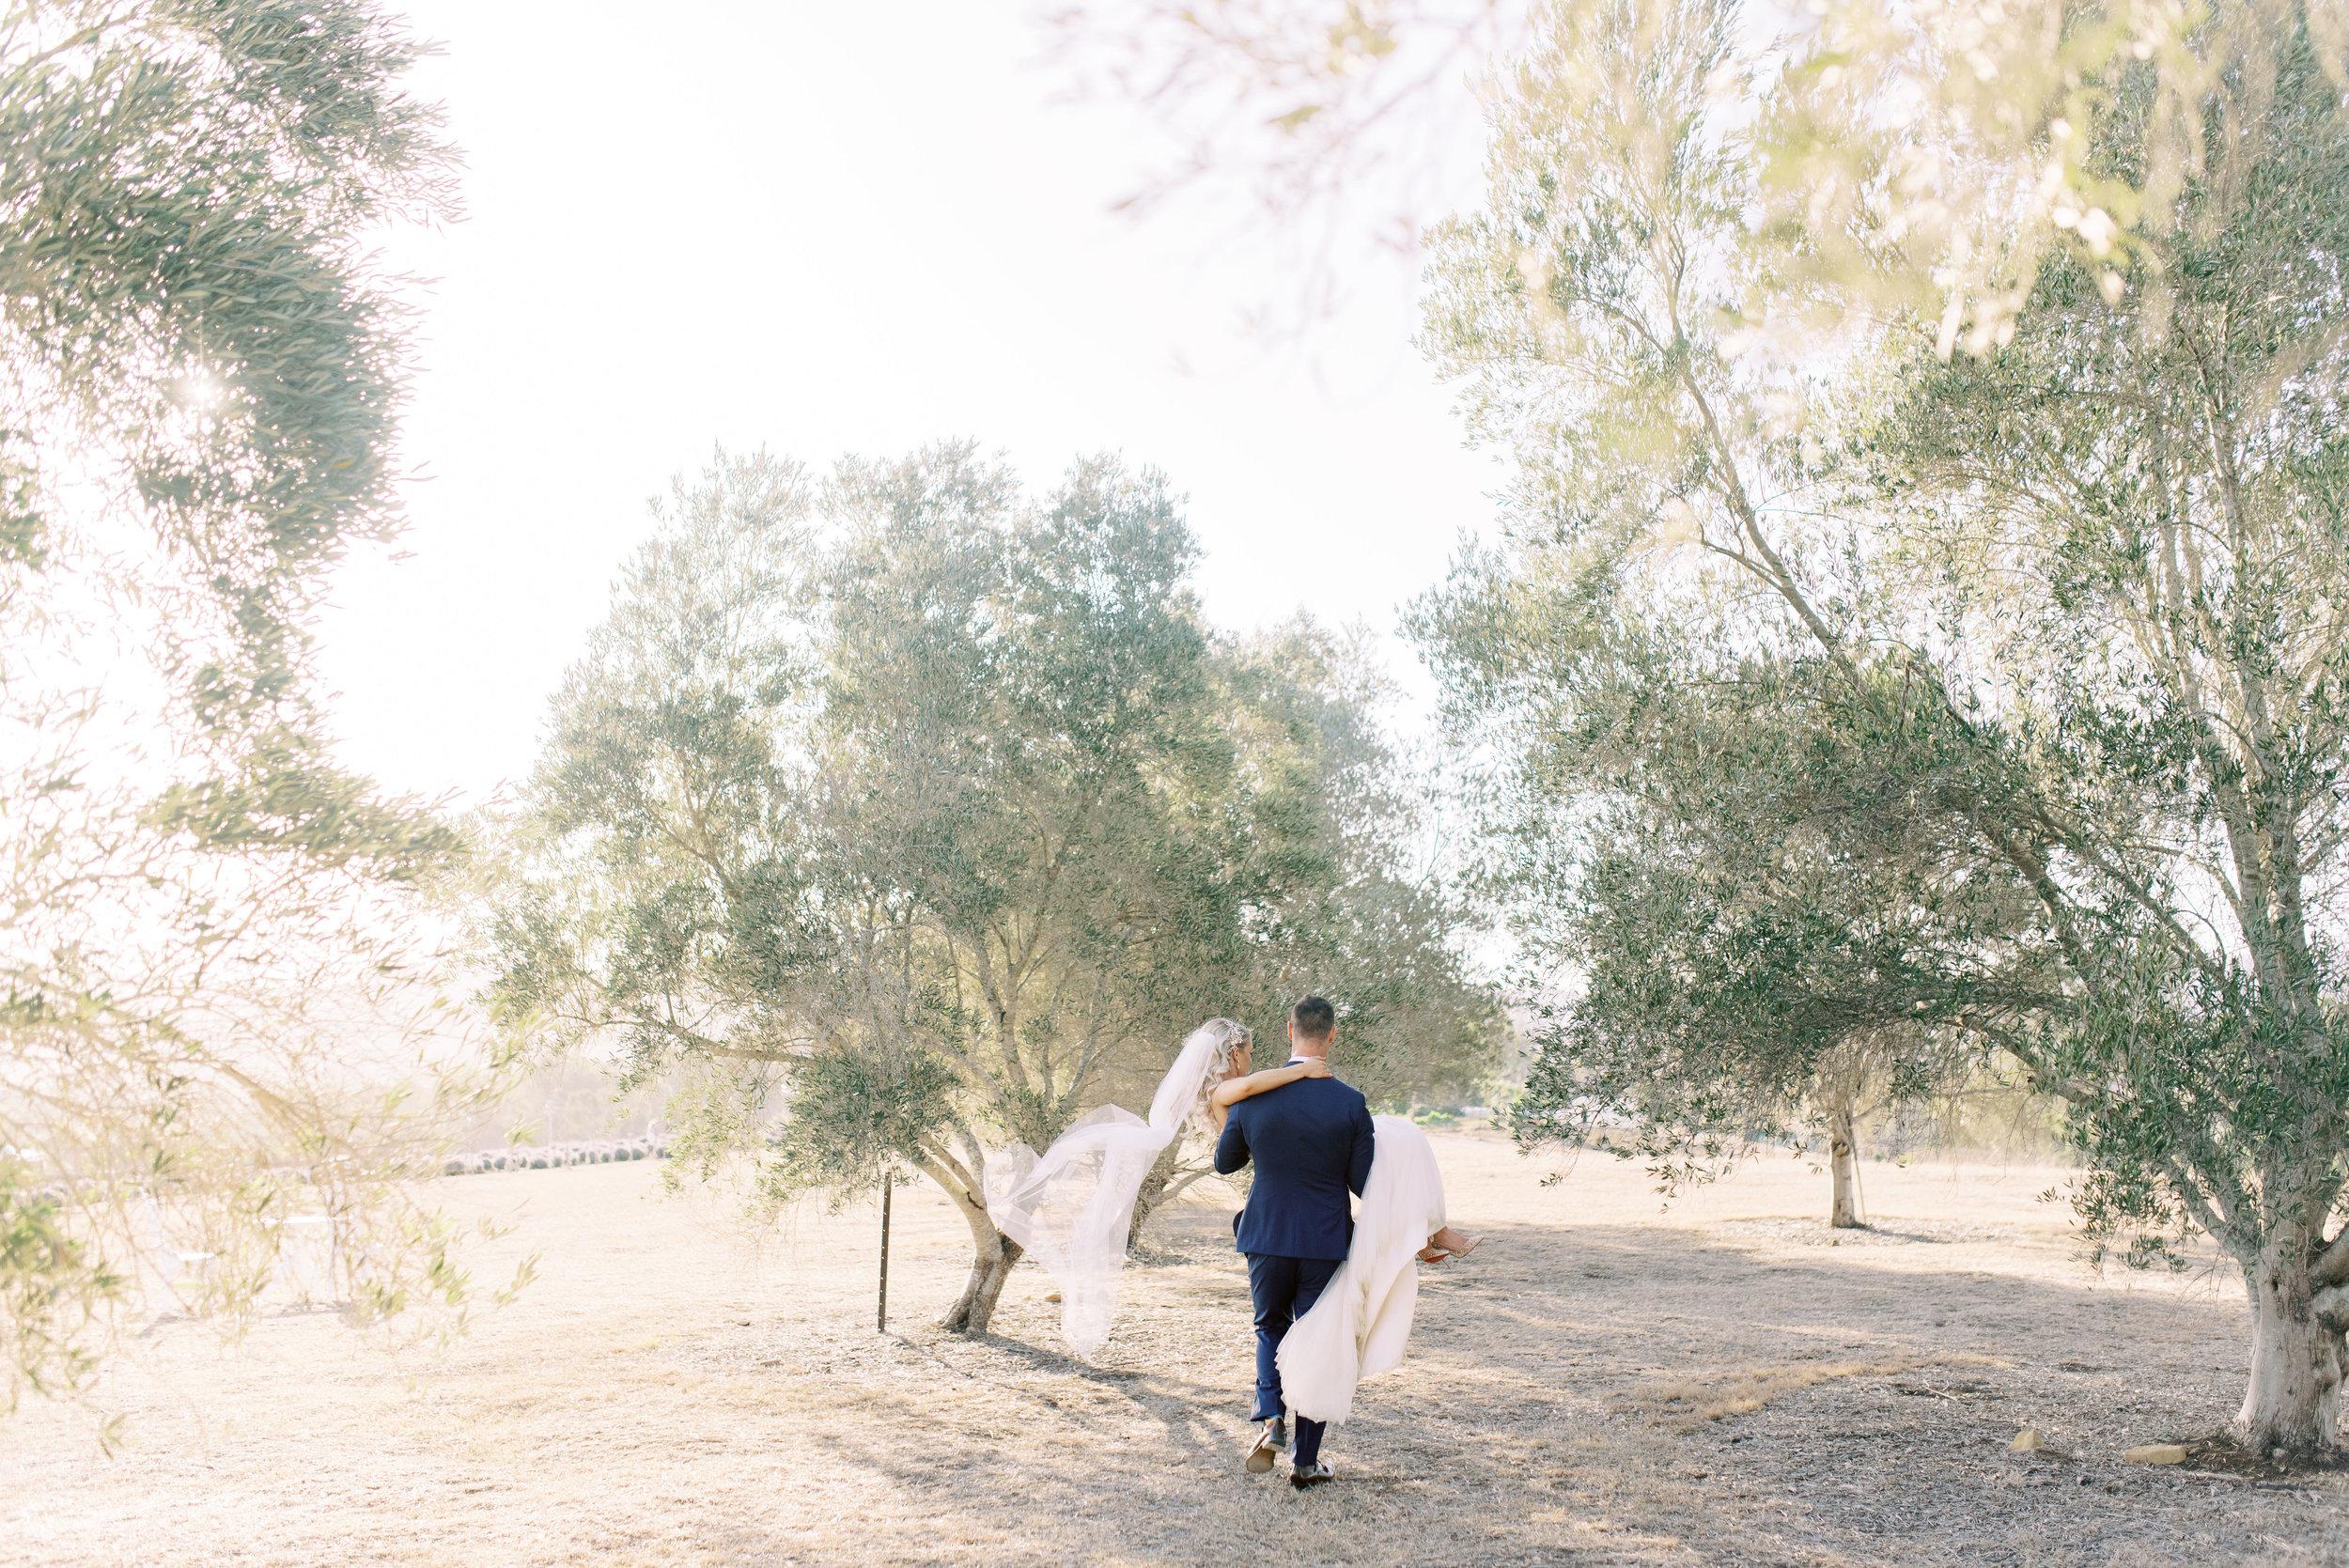 Kooroomba-Vineyard-Lavender-Farm-Wedding-Fine-Art-Lauren-Olivia-60.jpg